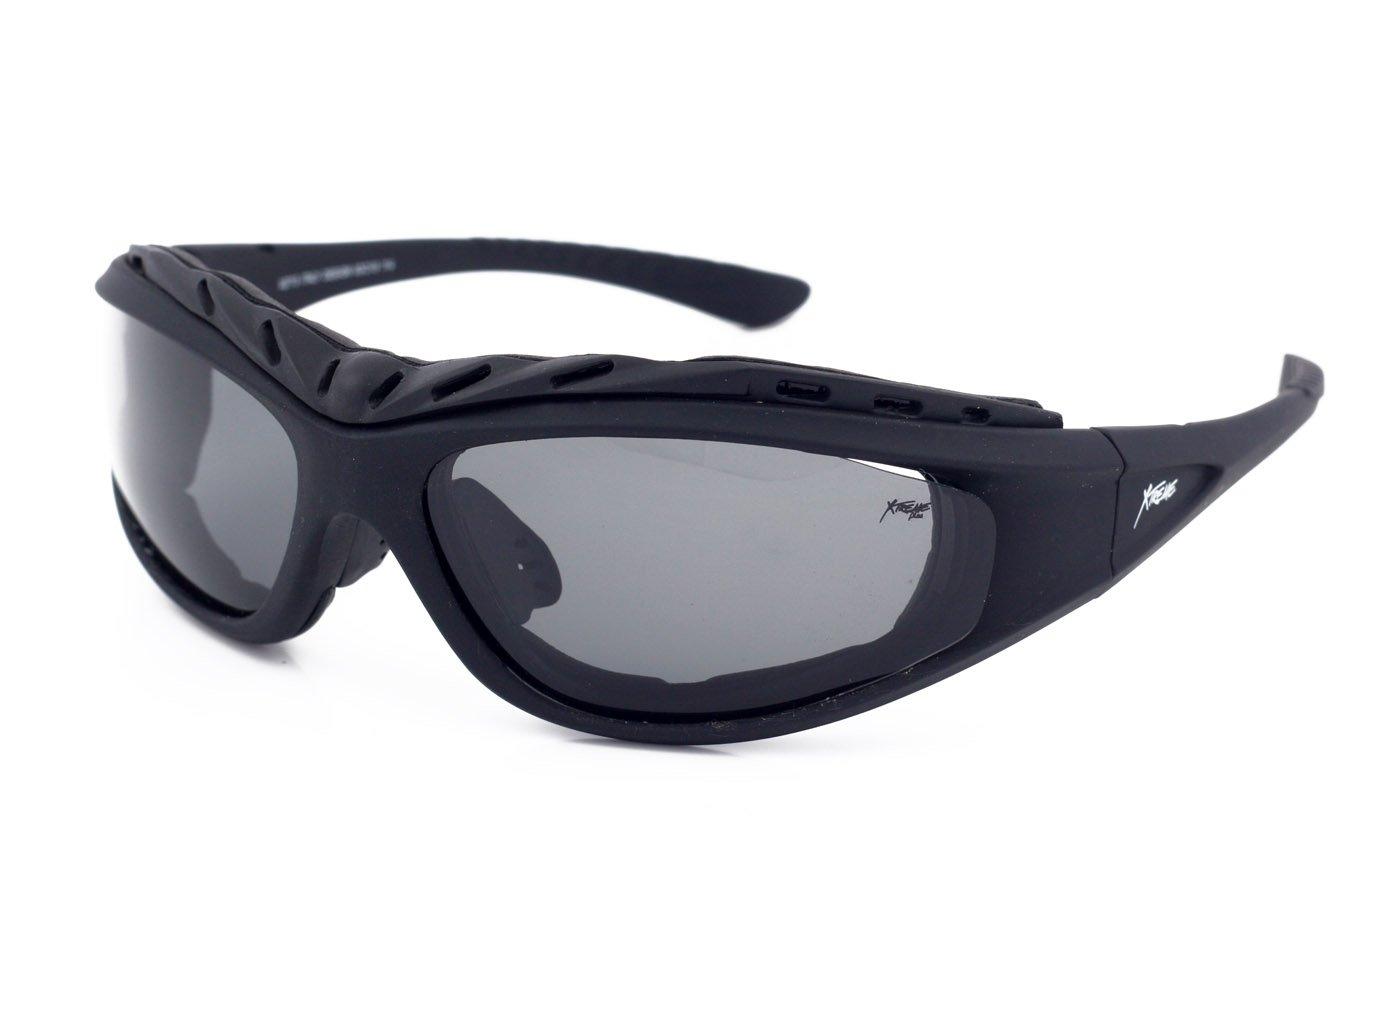 d45d5ac35bc Xtreme Plus Sports Polarised Sunglasses Goggles for Men Women Unisex  Kayaking